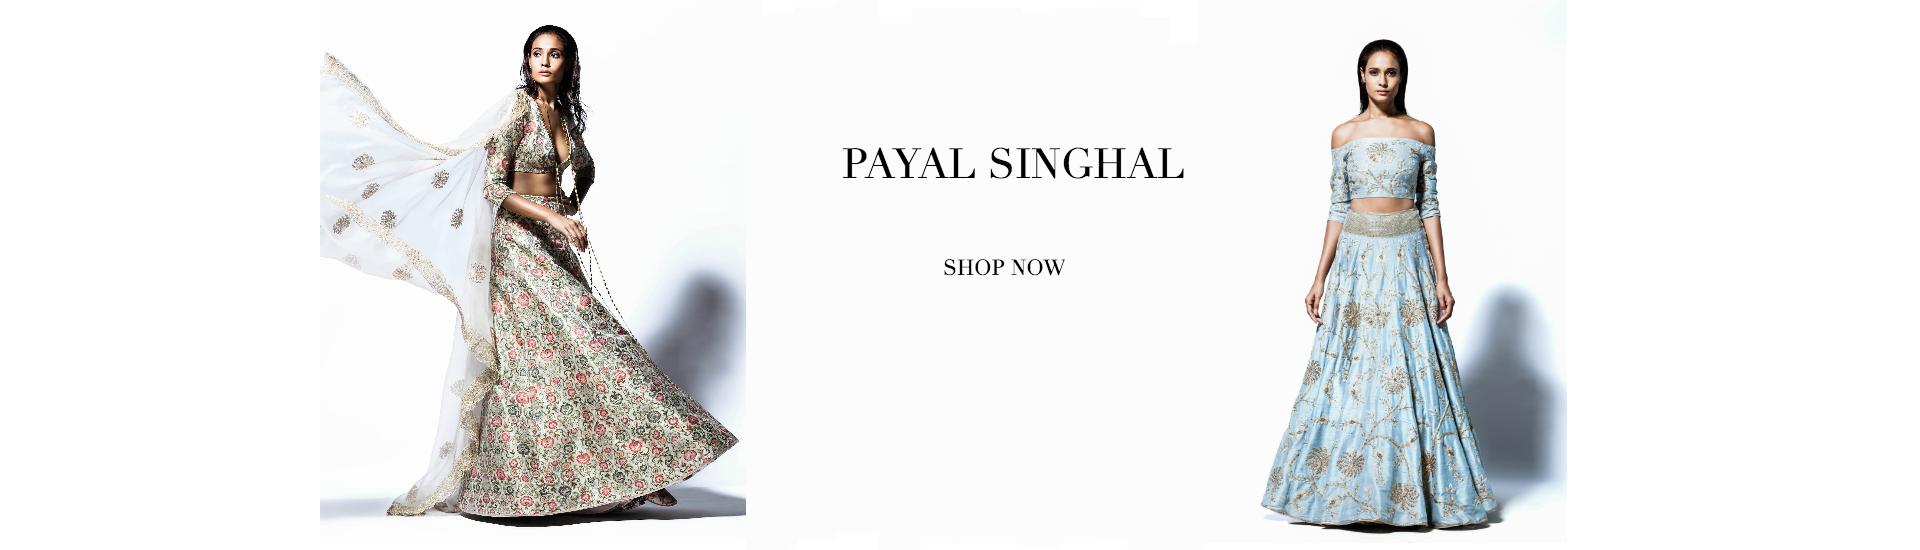 Payal Singhal